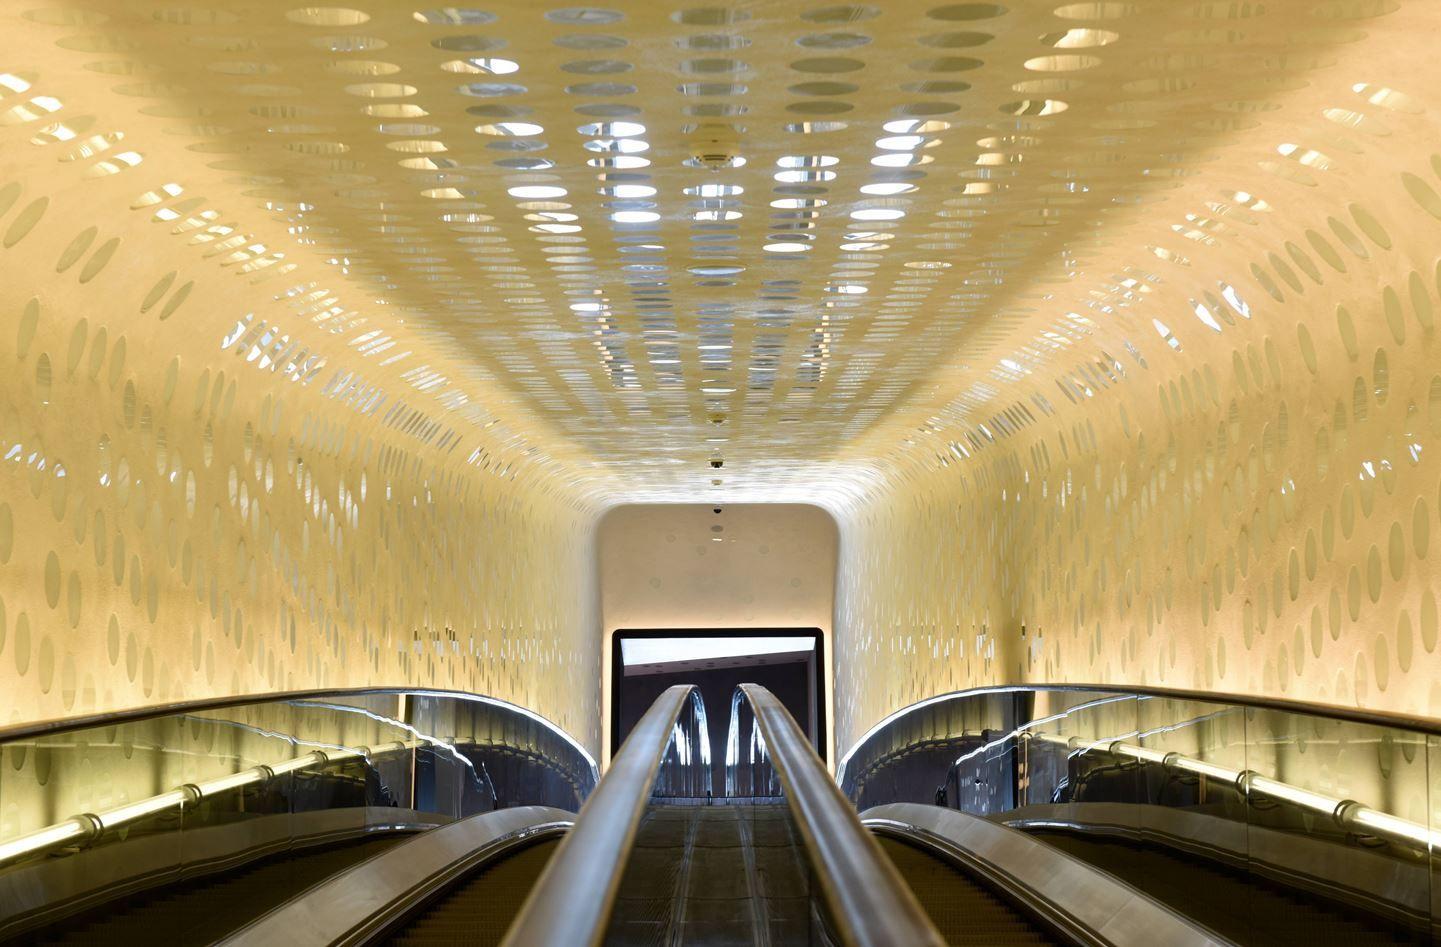 Elbphilharmonie Picture Gallery Building Innovative Architecture Architecture